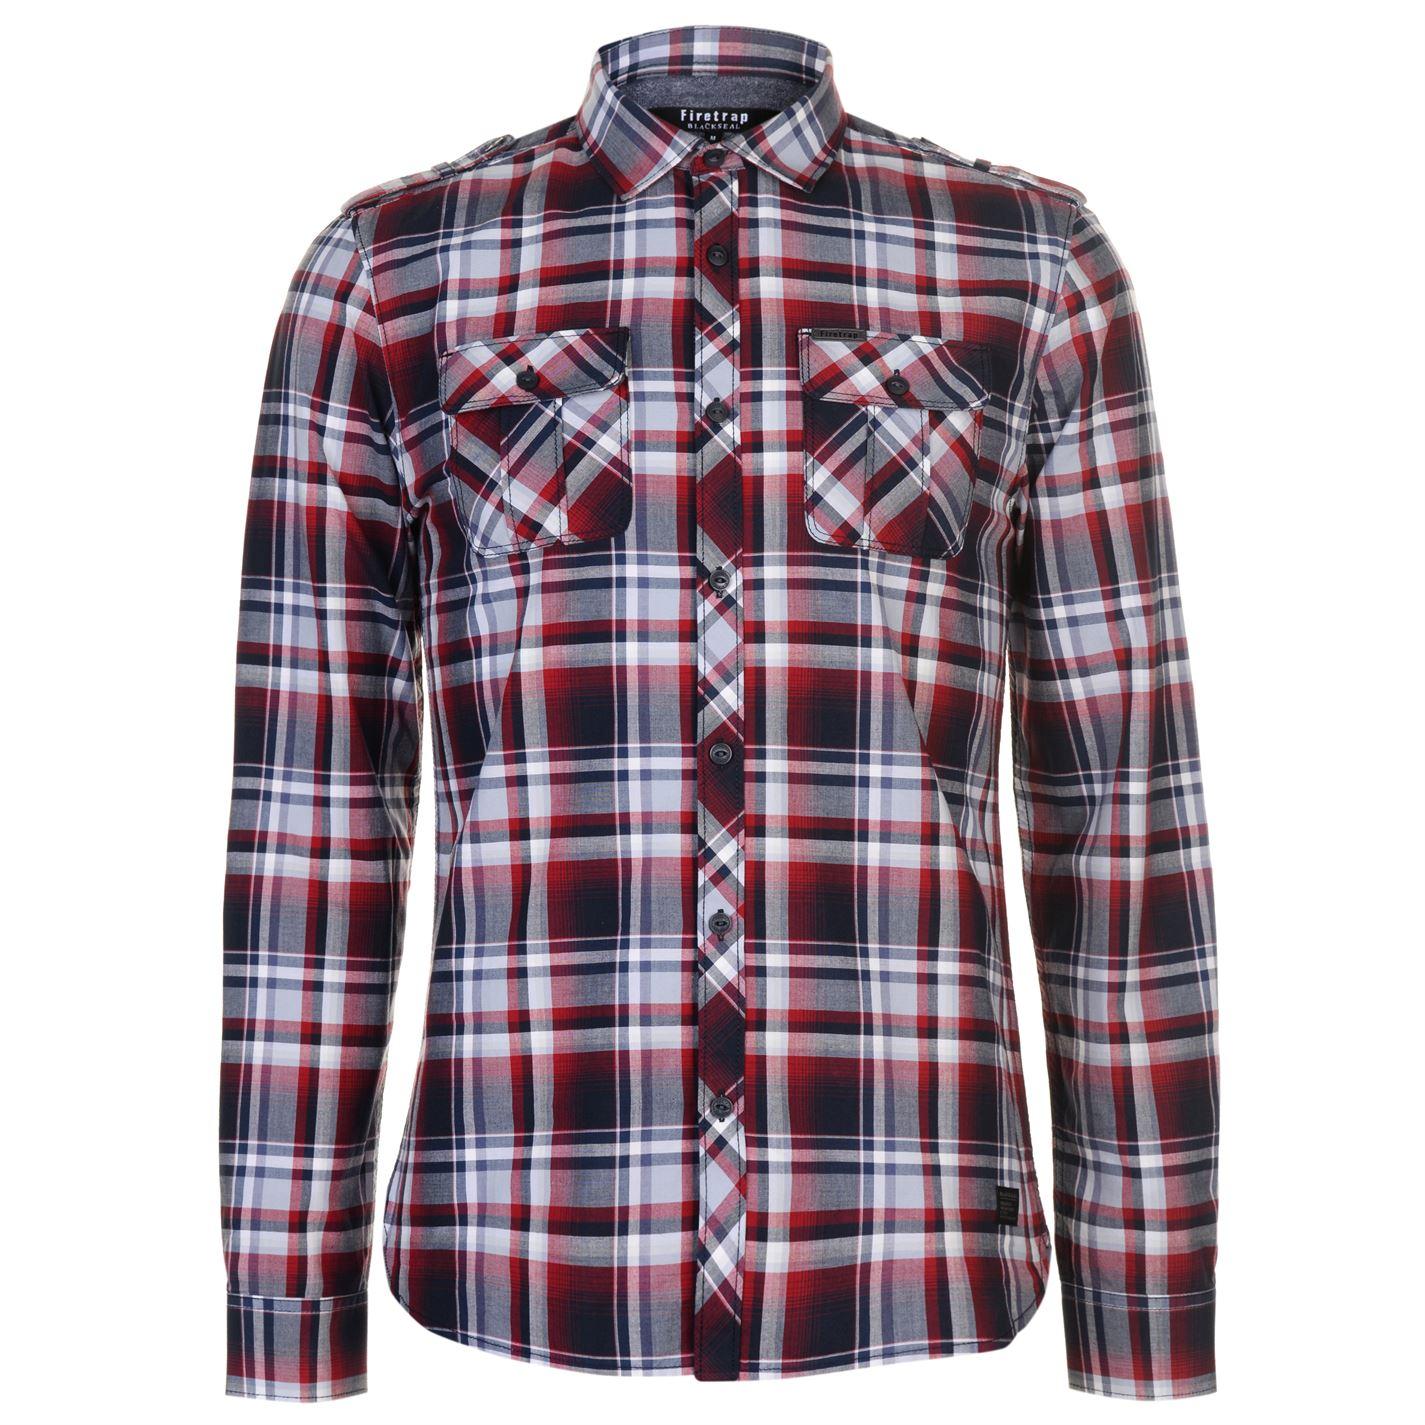 Košile pánská Firetrap Blackseal Checked Red - Glami.cz 61dd4619fd